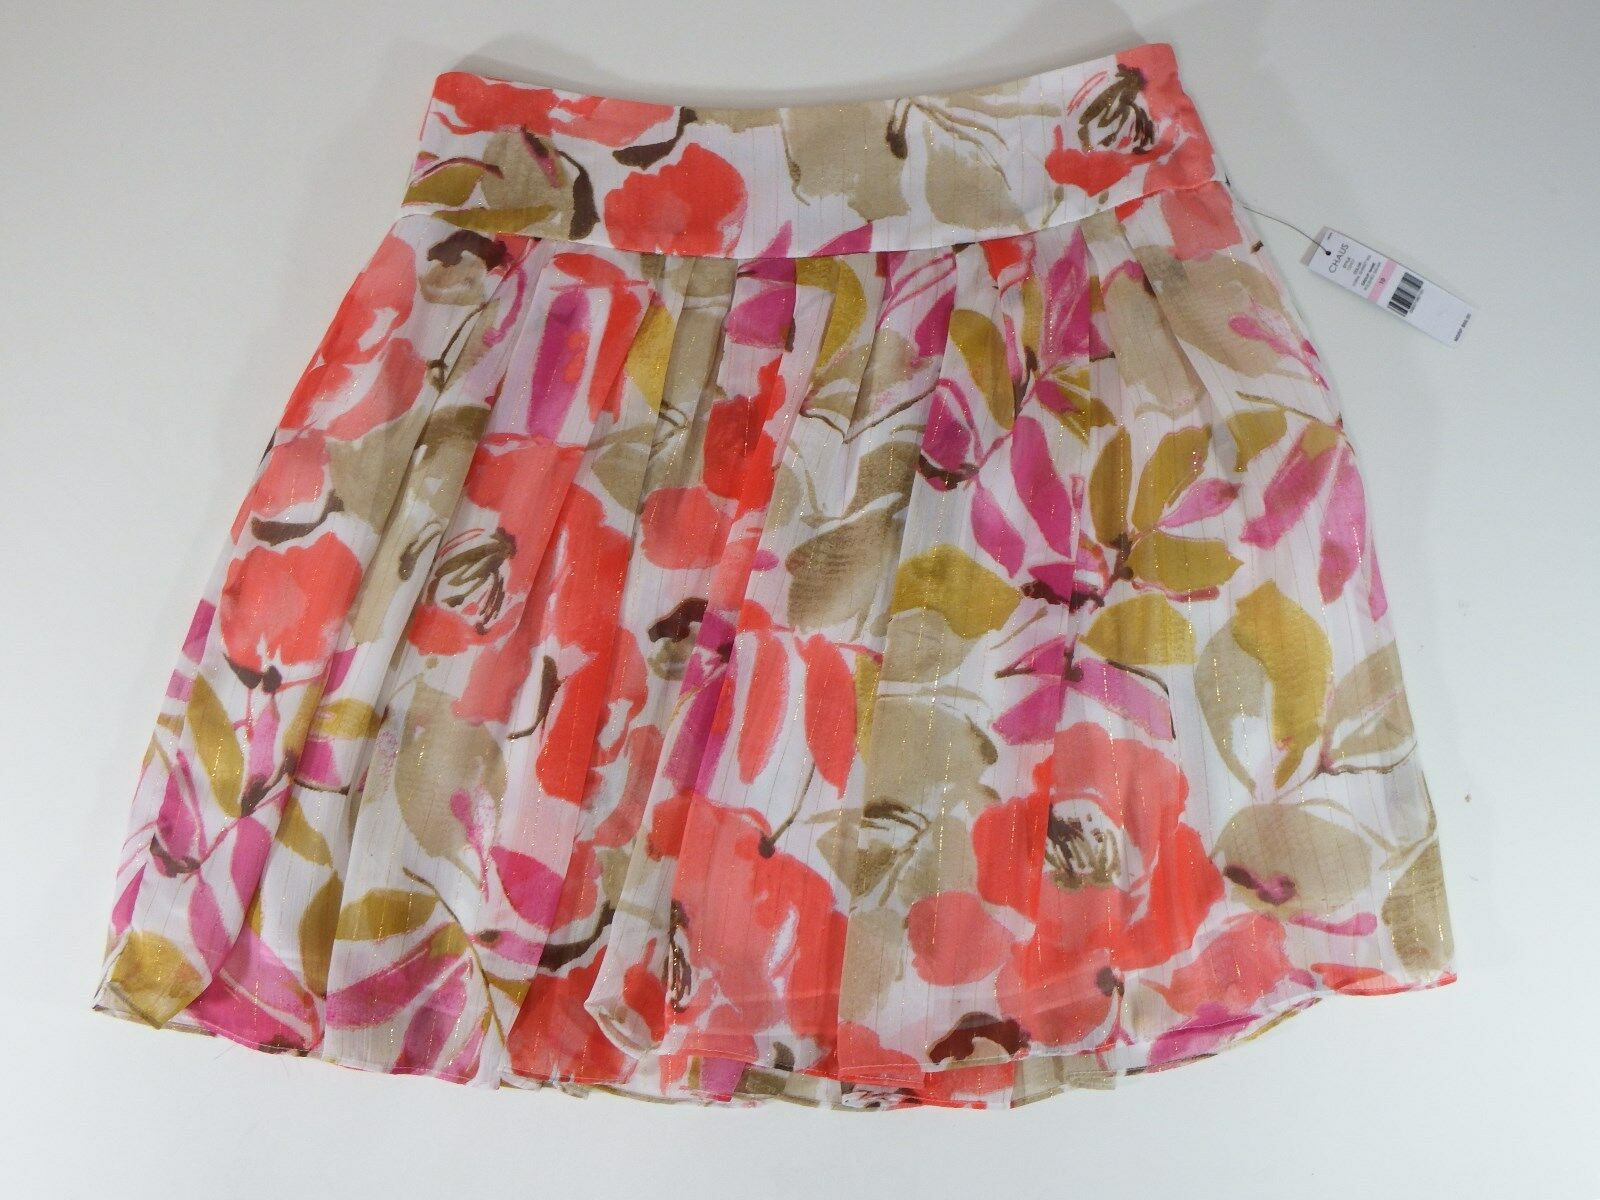 Women skirts chaus full mini skirt floral designs polished safari size reg 10